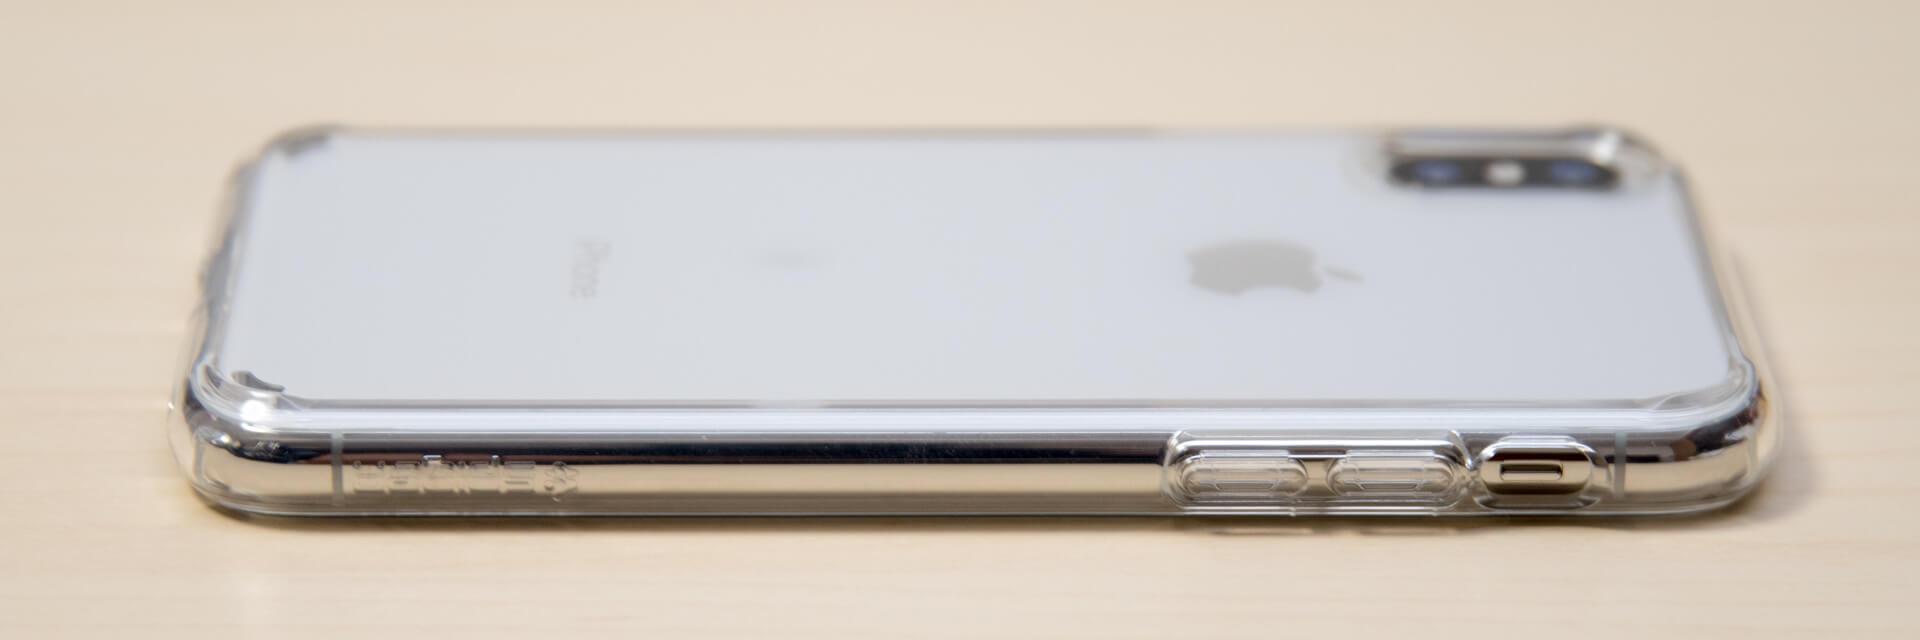 Spigen iPhone X ケース ウルトラ・ハイブリッド 7